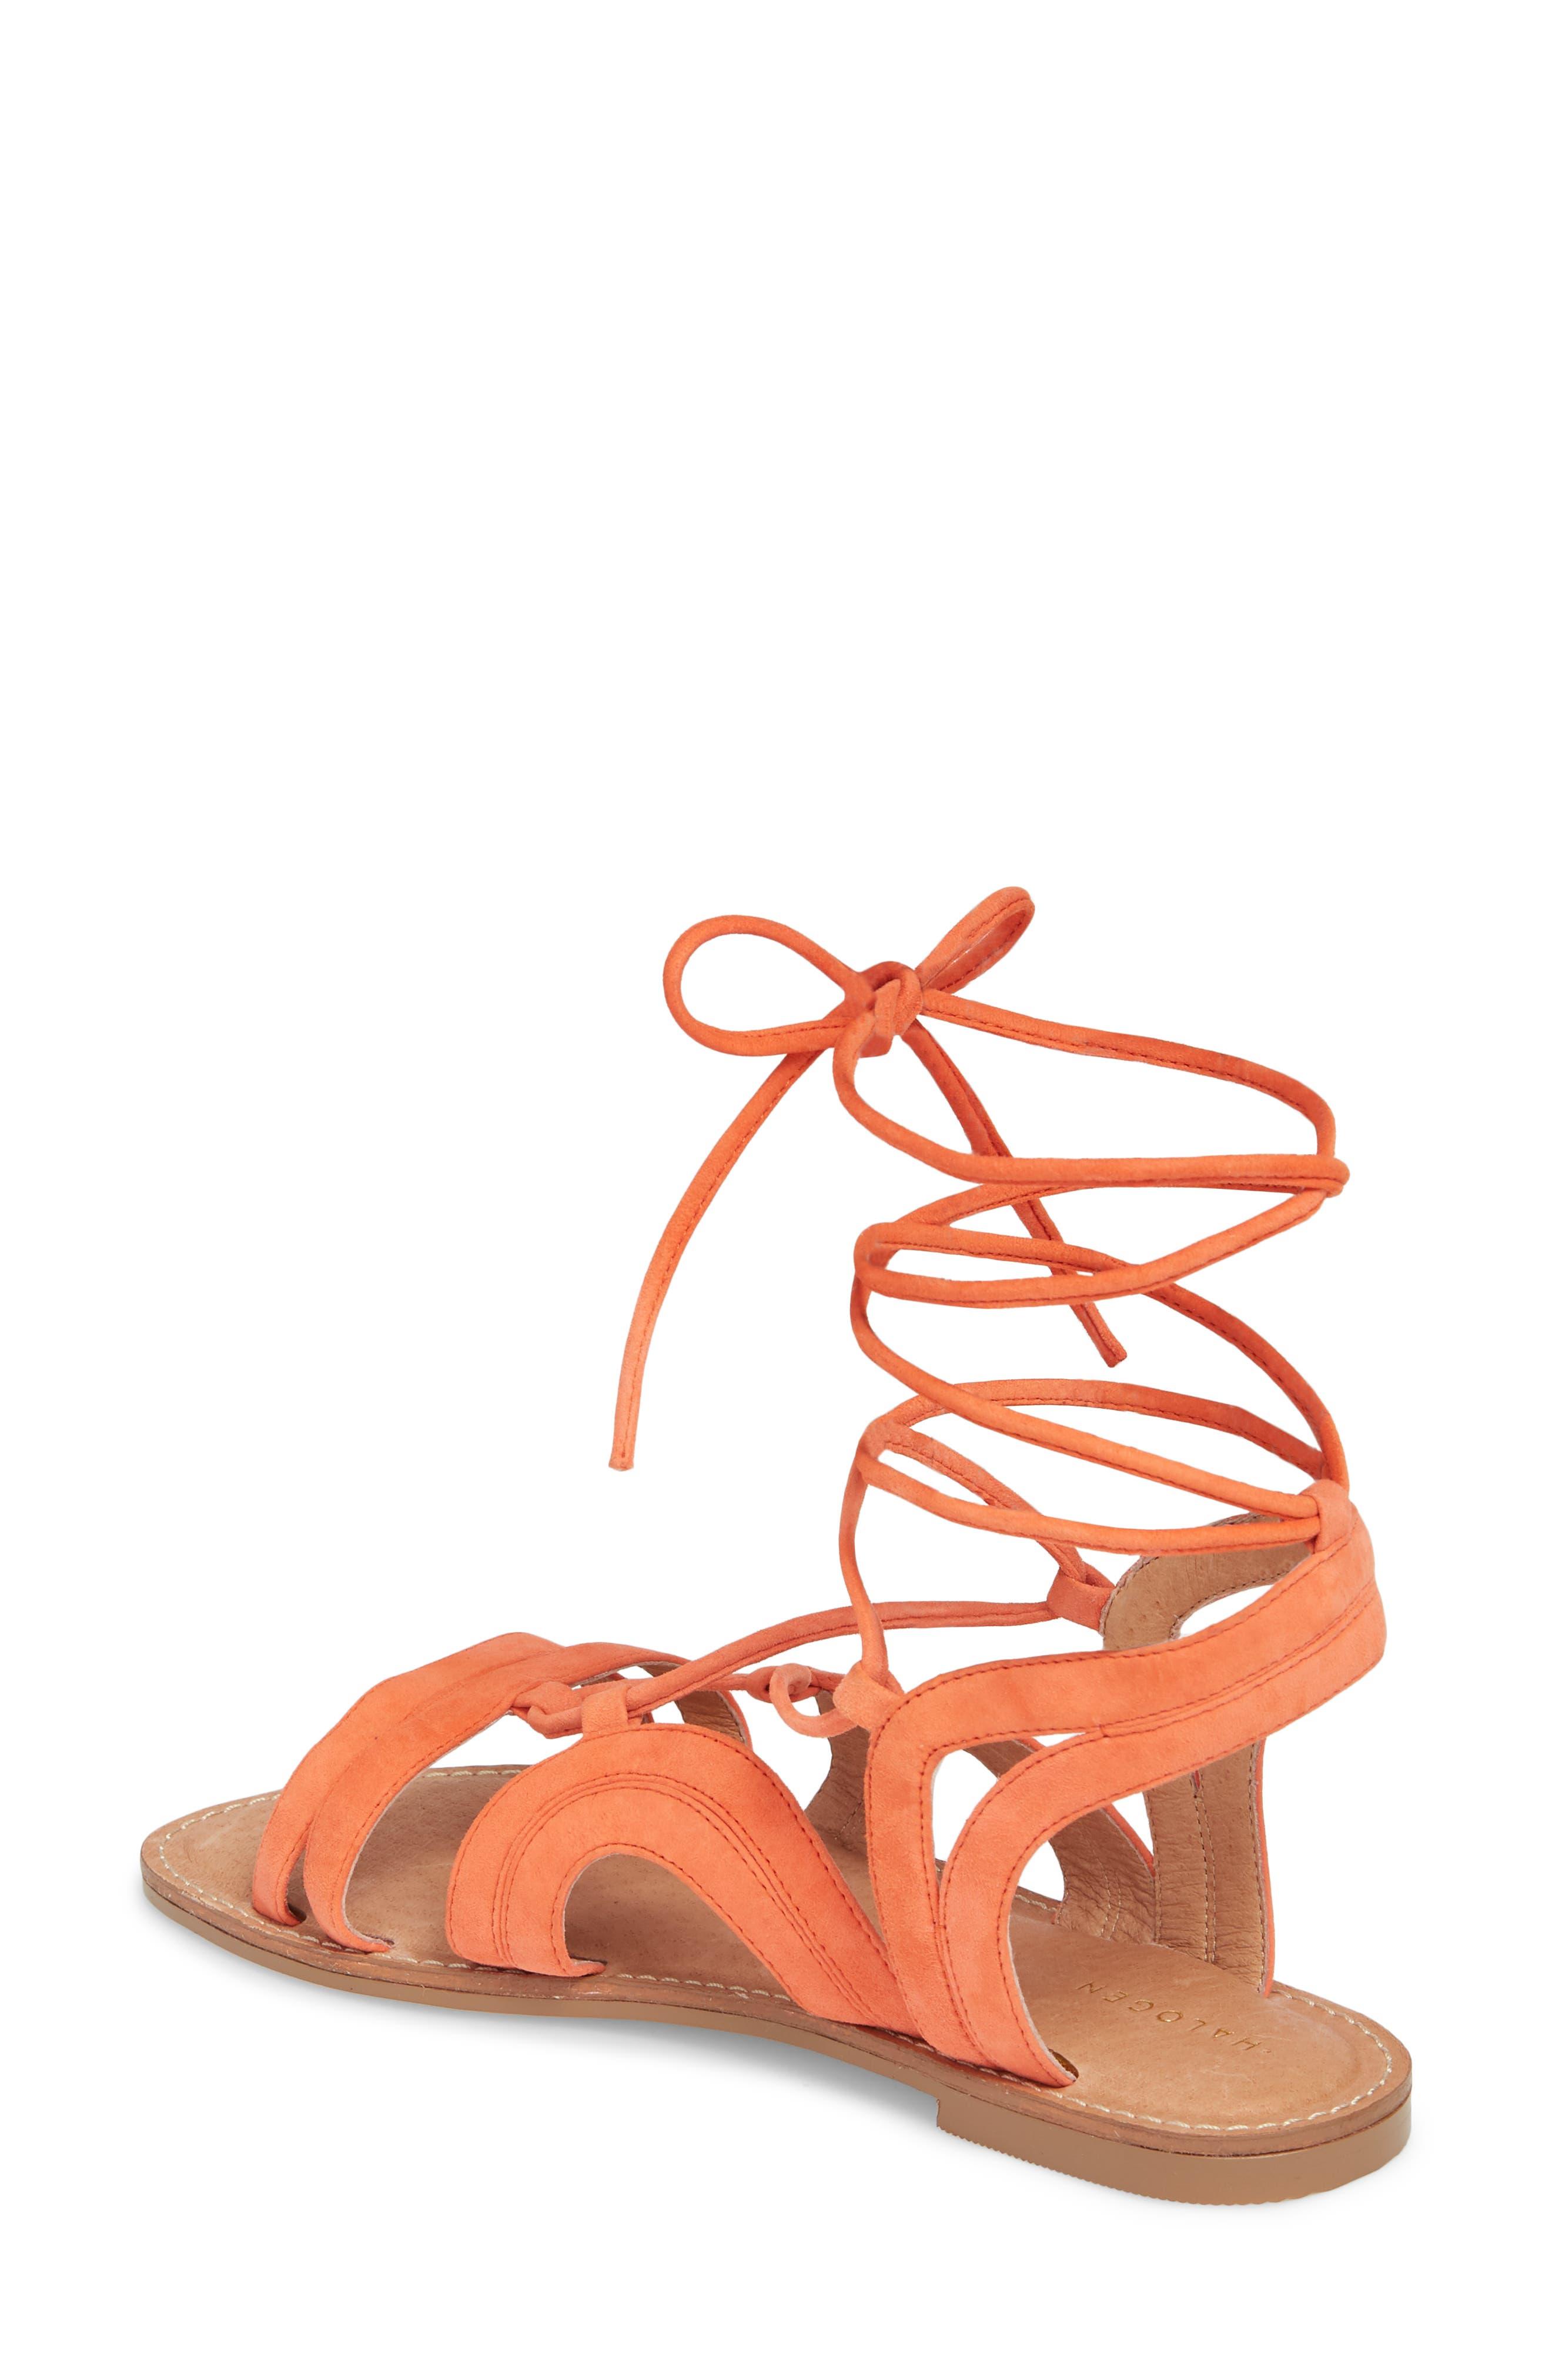 Lilian Gladiator Sandal,                             Alternate thumbnail 2, color,                             Orange Suede